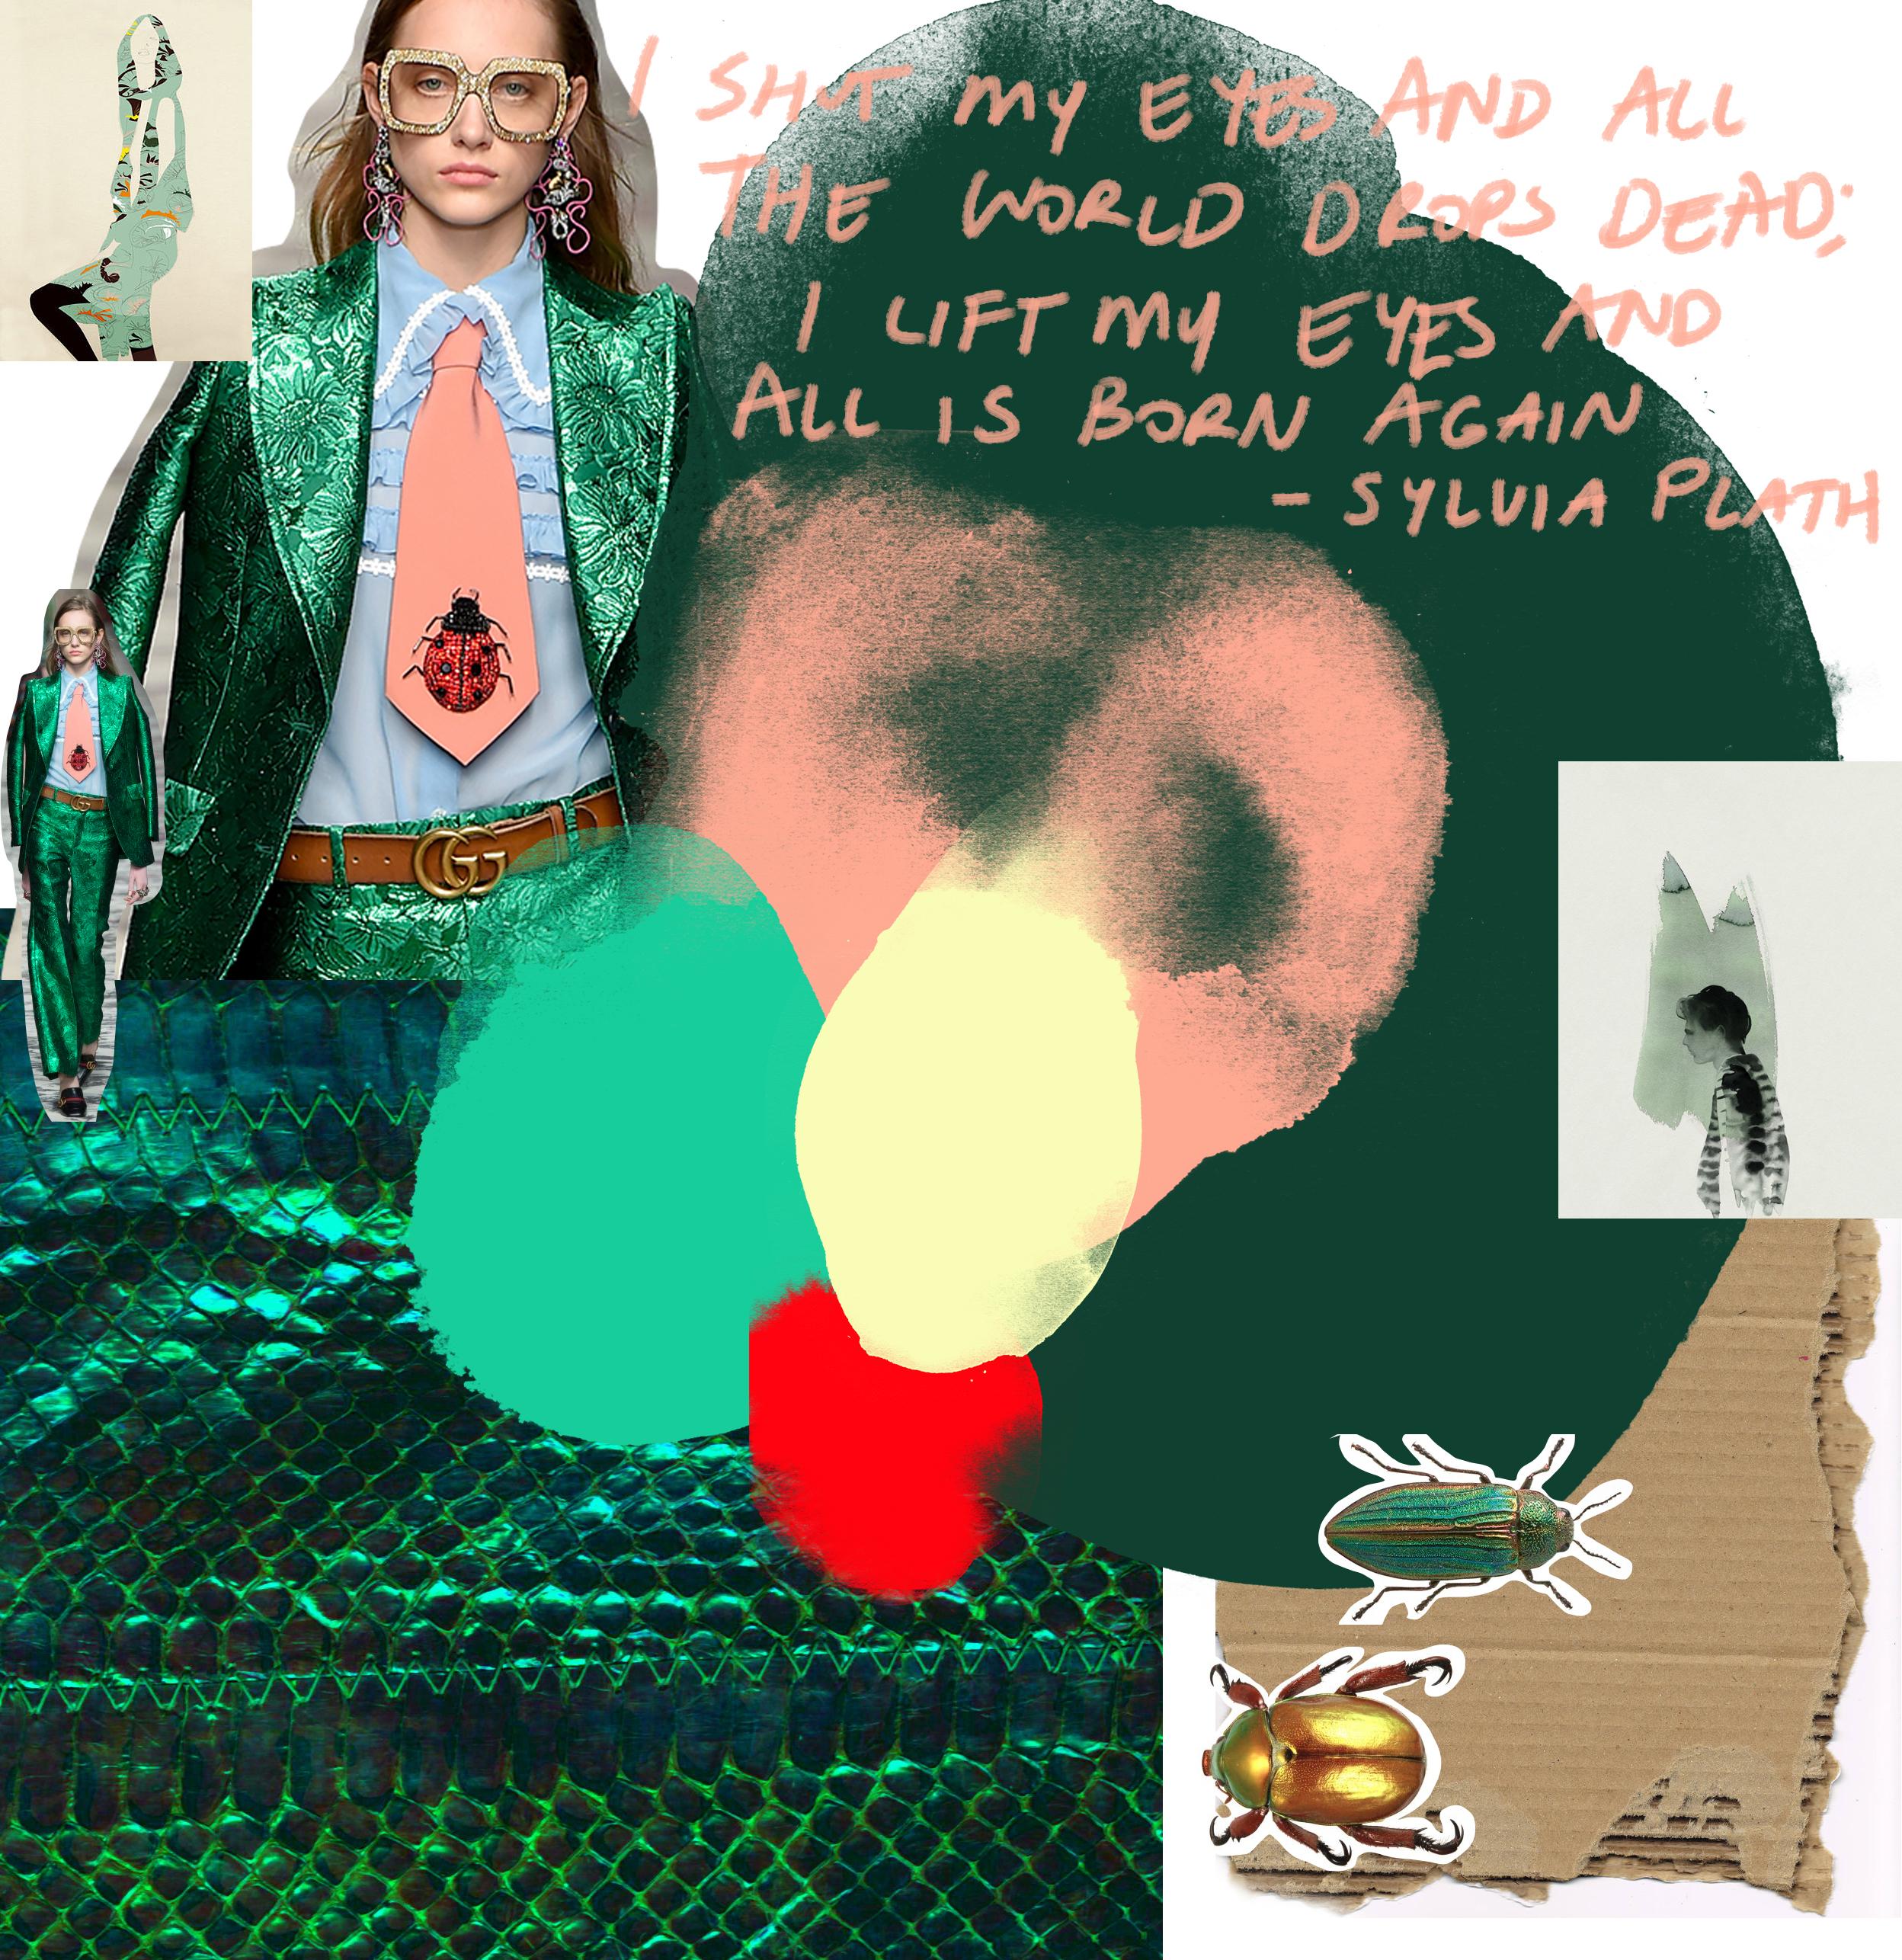 Illustration credits - Cecilia Carlstedt /Fashion credits - Gucci /Words - Sylvia Plath